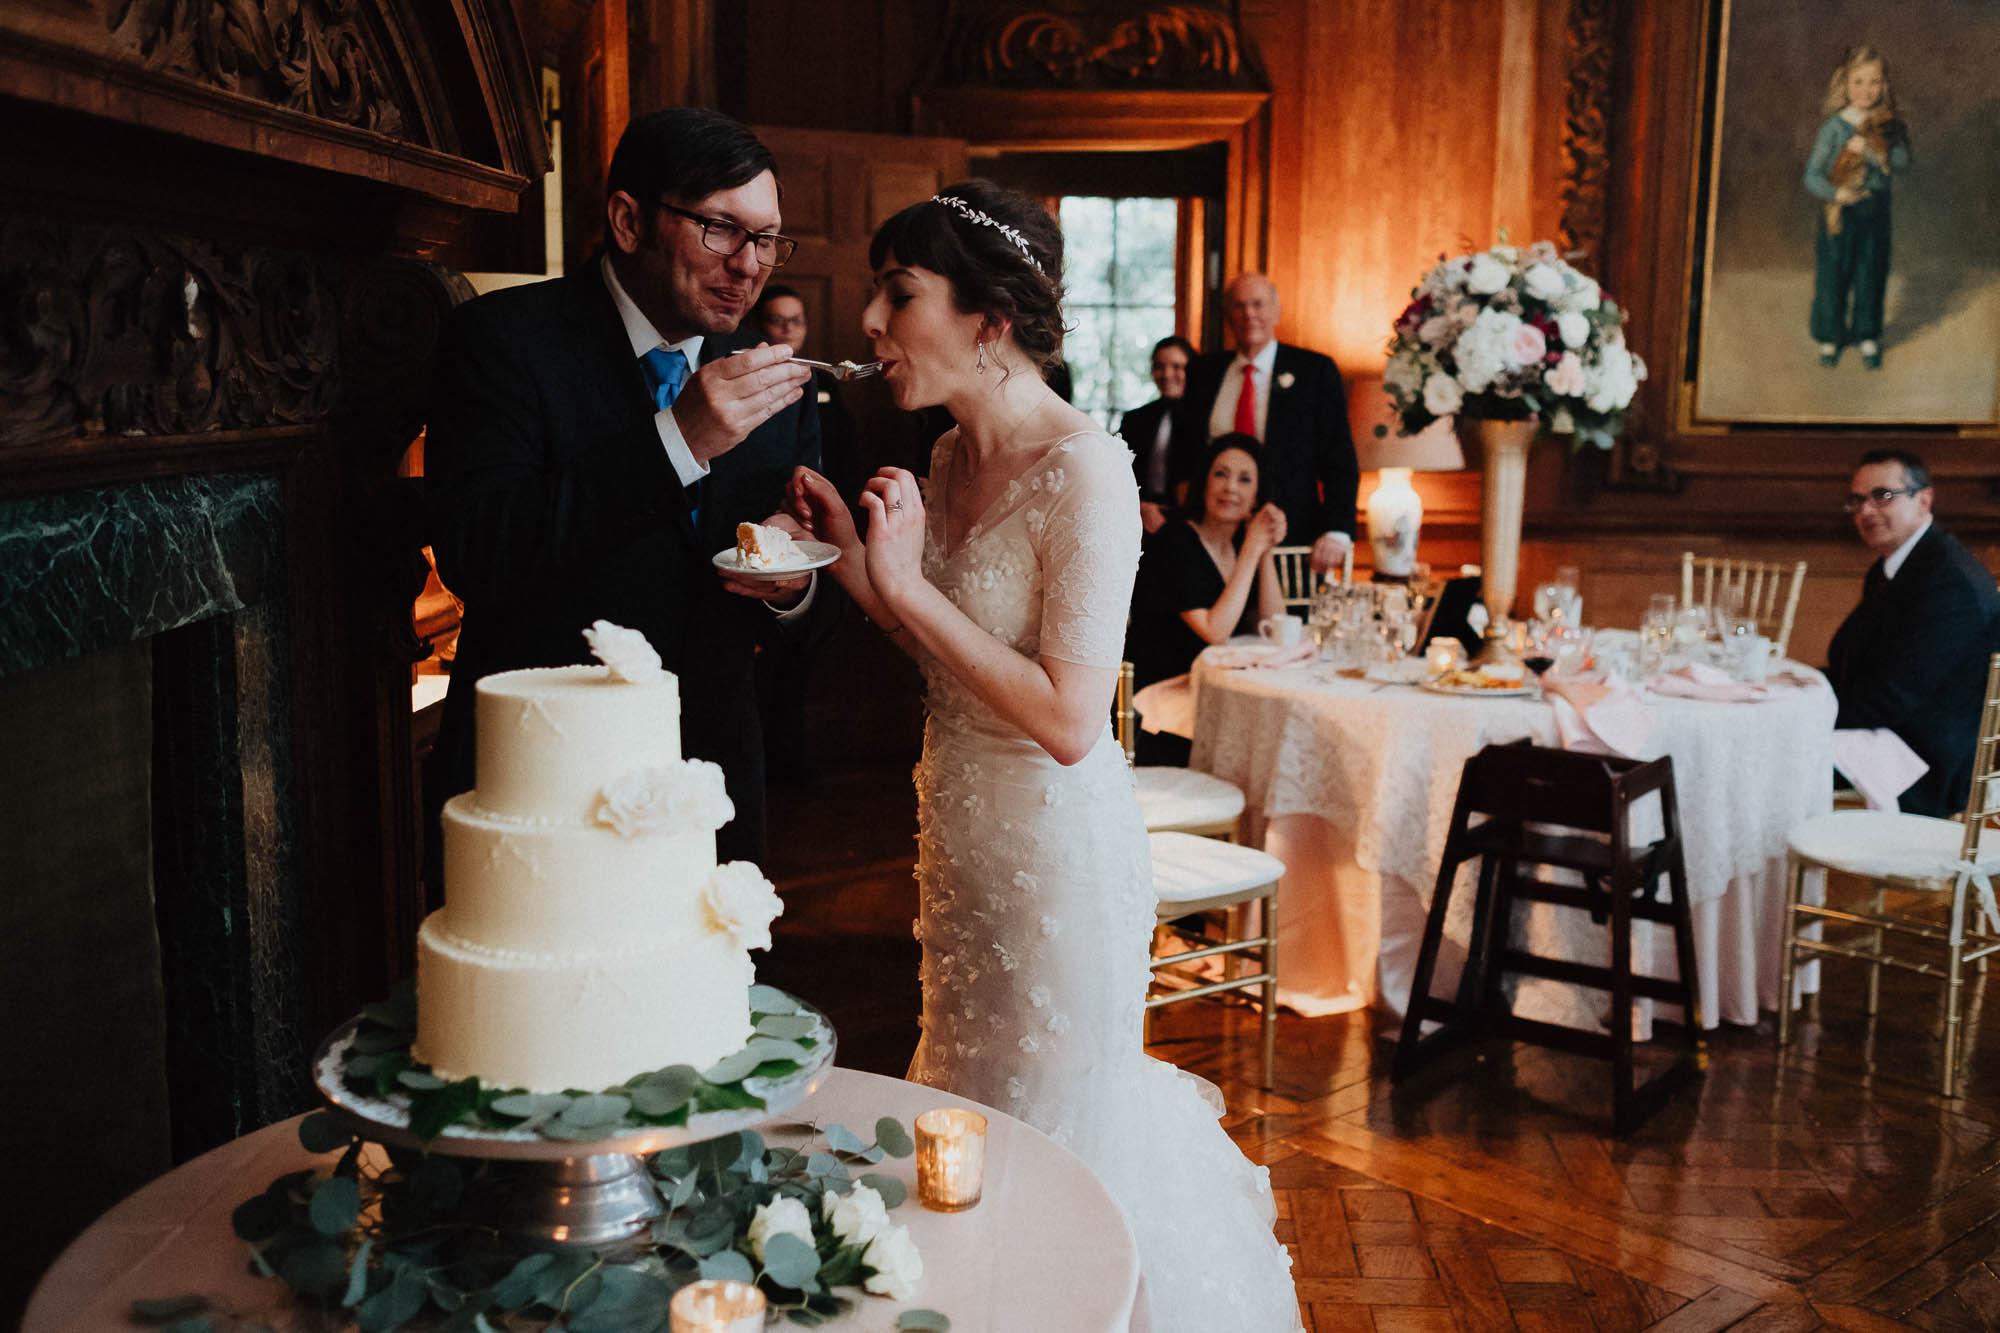 Claudia-Stephen-Peterloon-Wedding-Cincinnati-Ohio-084.jpg